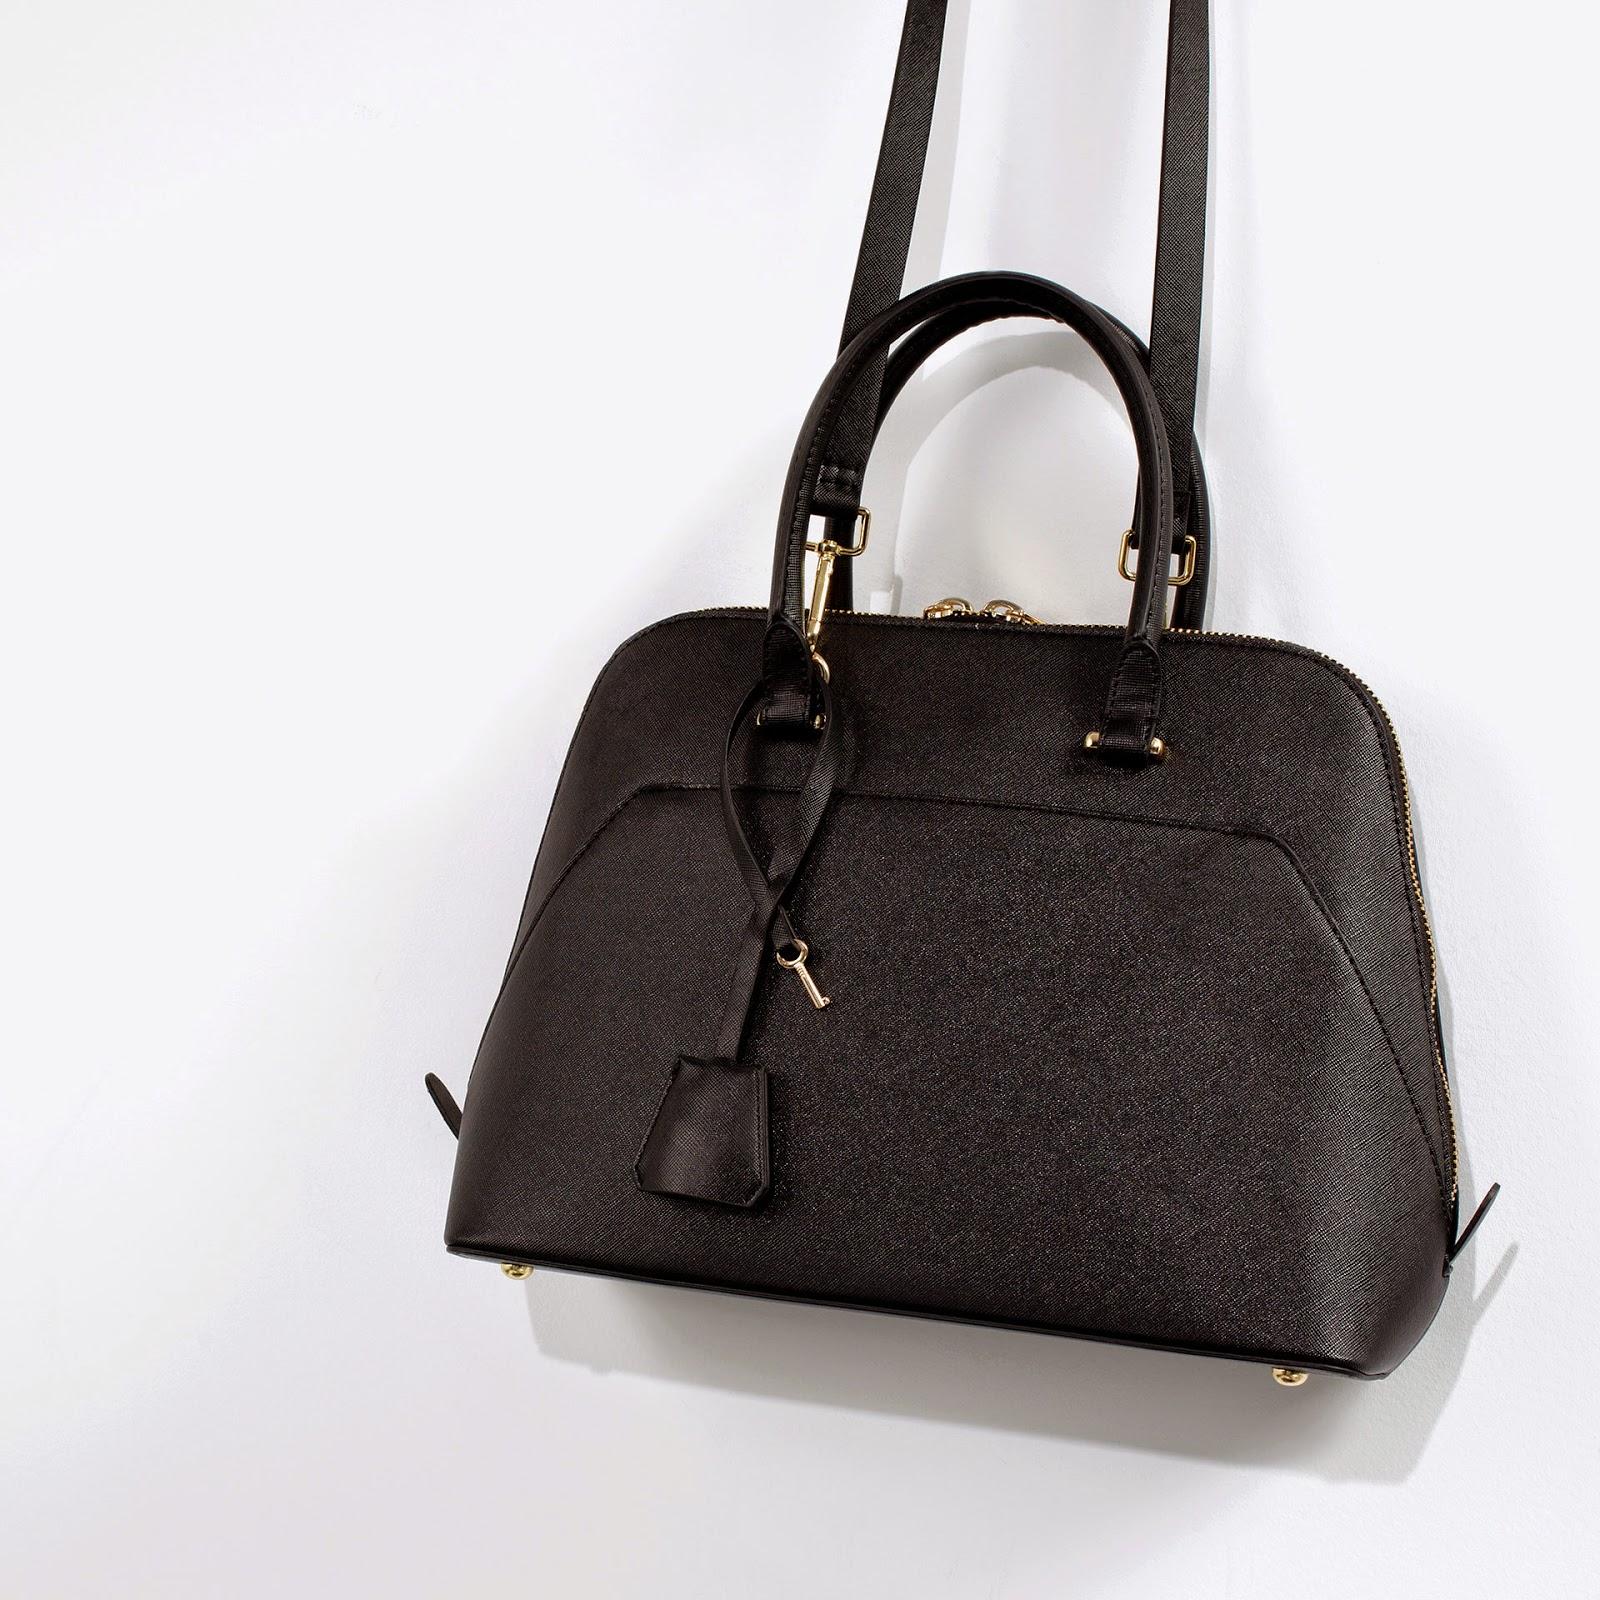 http://www.zara.com/uk/en/woman/handbags/hand-bags/mini-citybag-c269201p1984438.html